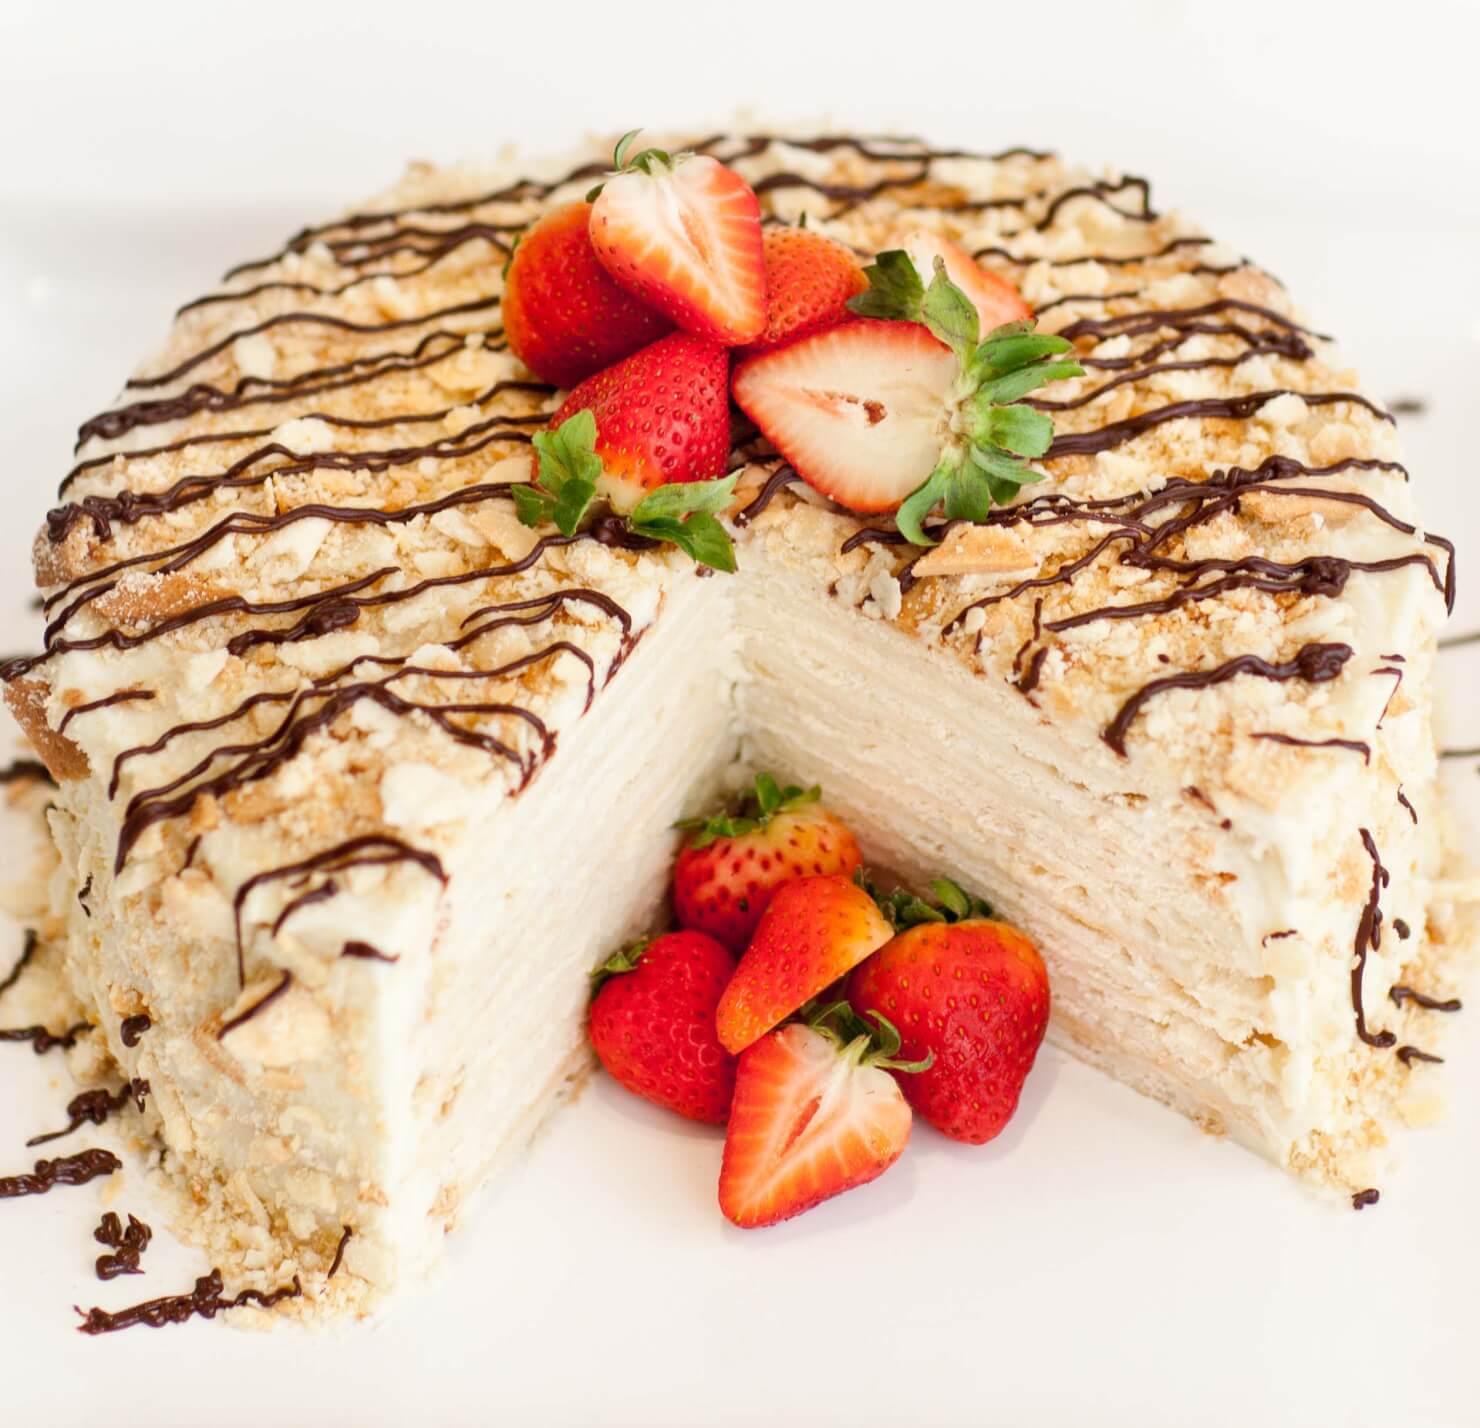 Торт наполеон фото украшений